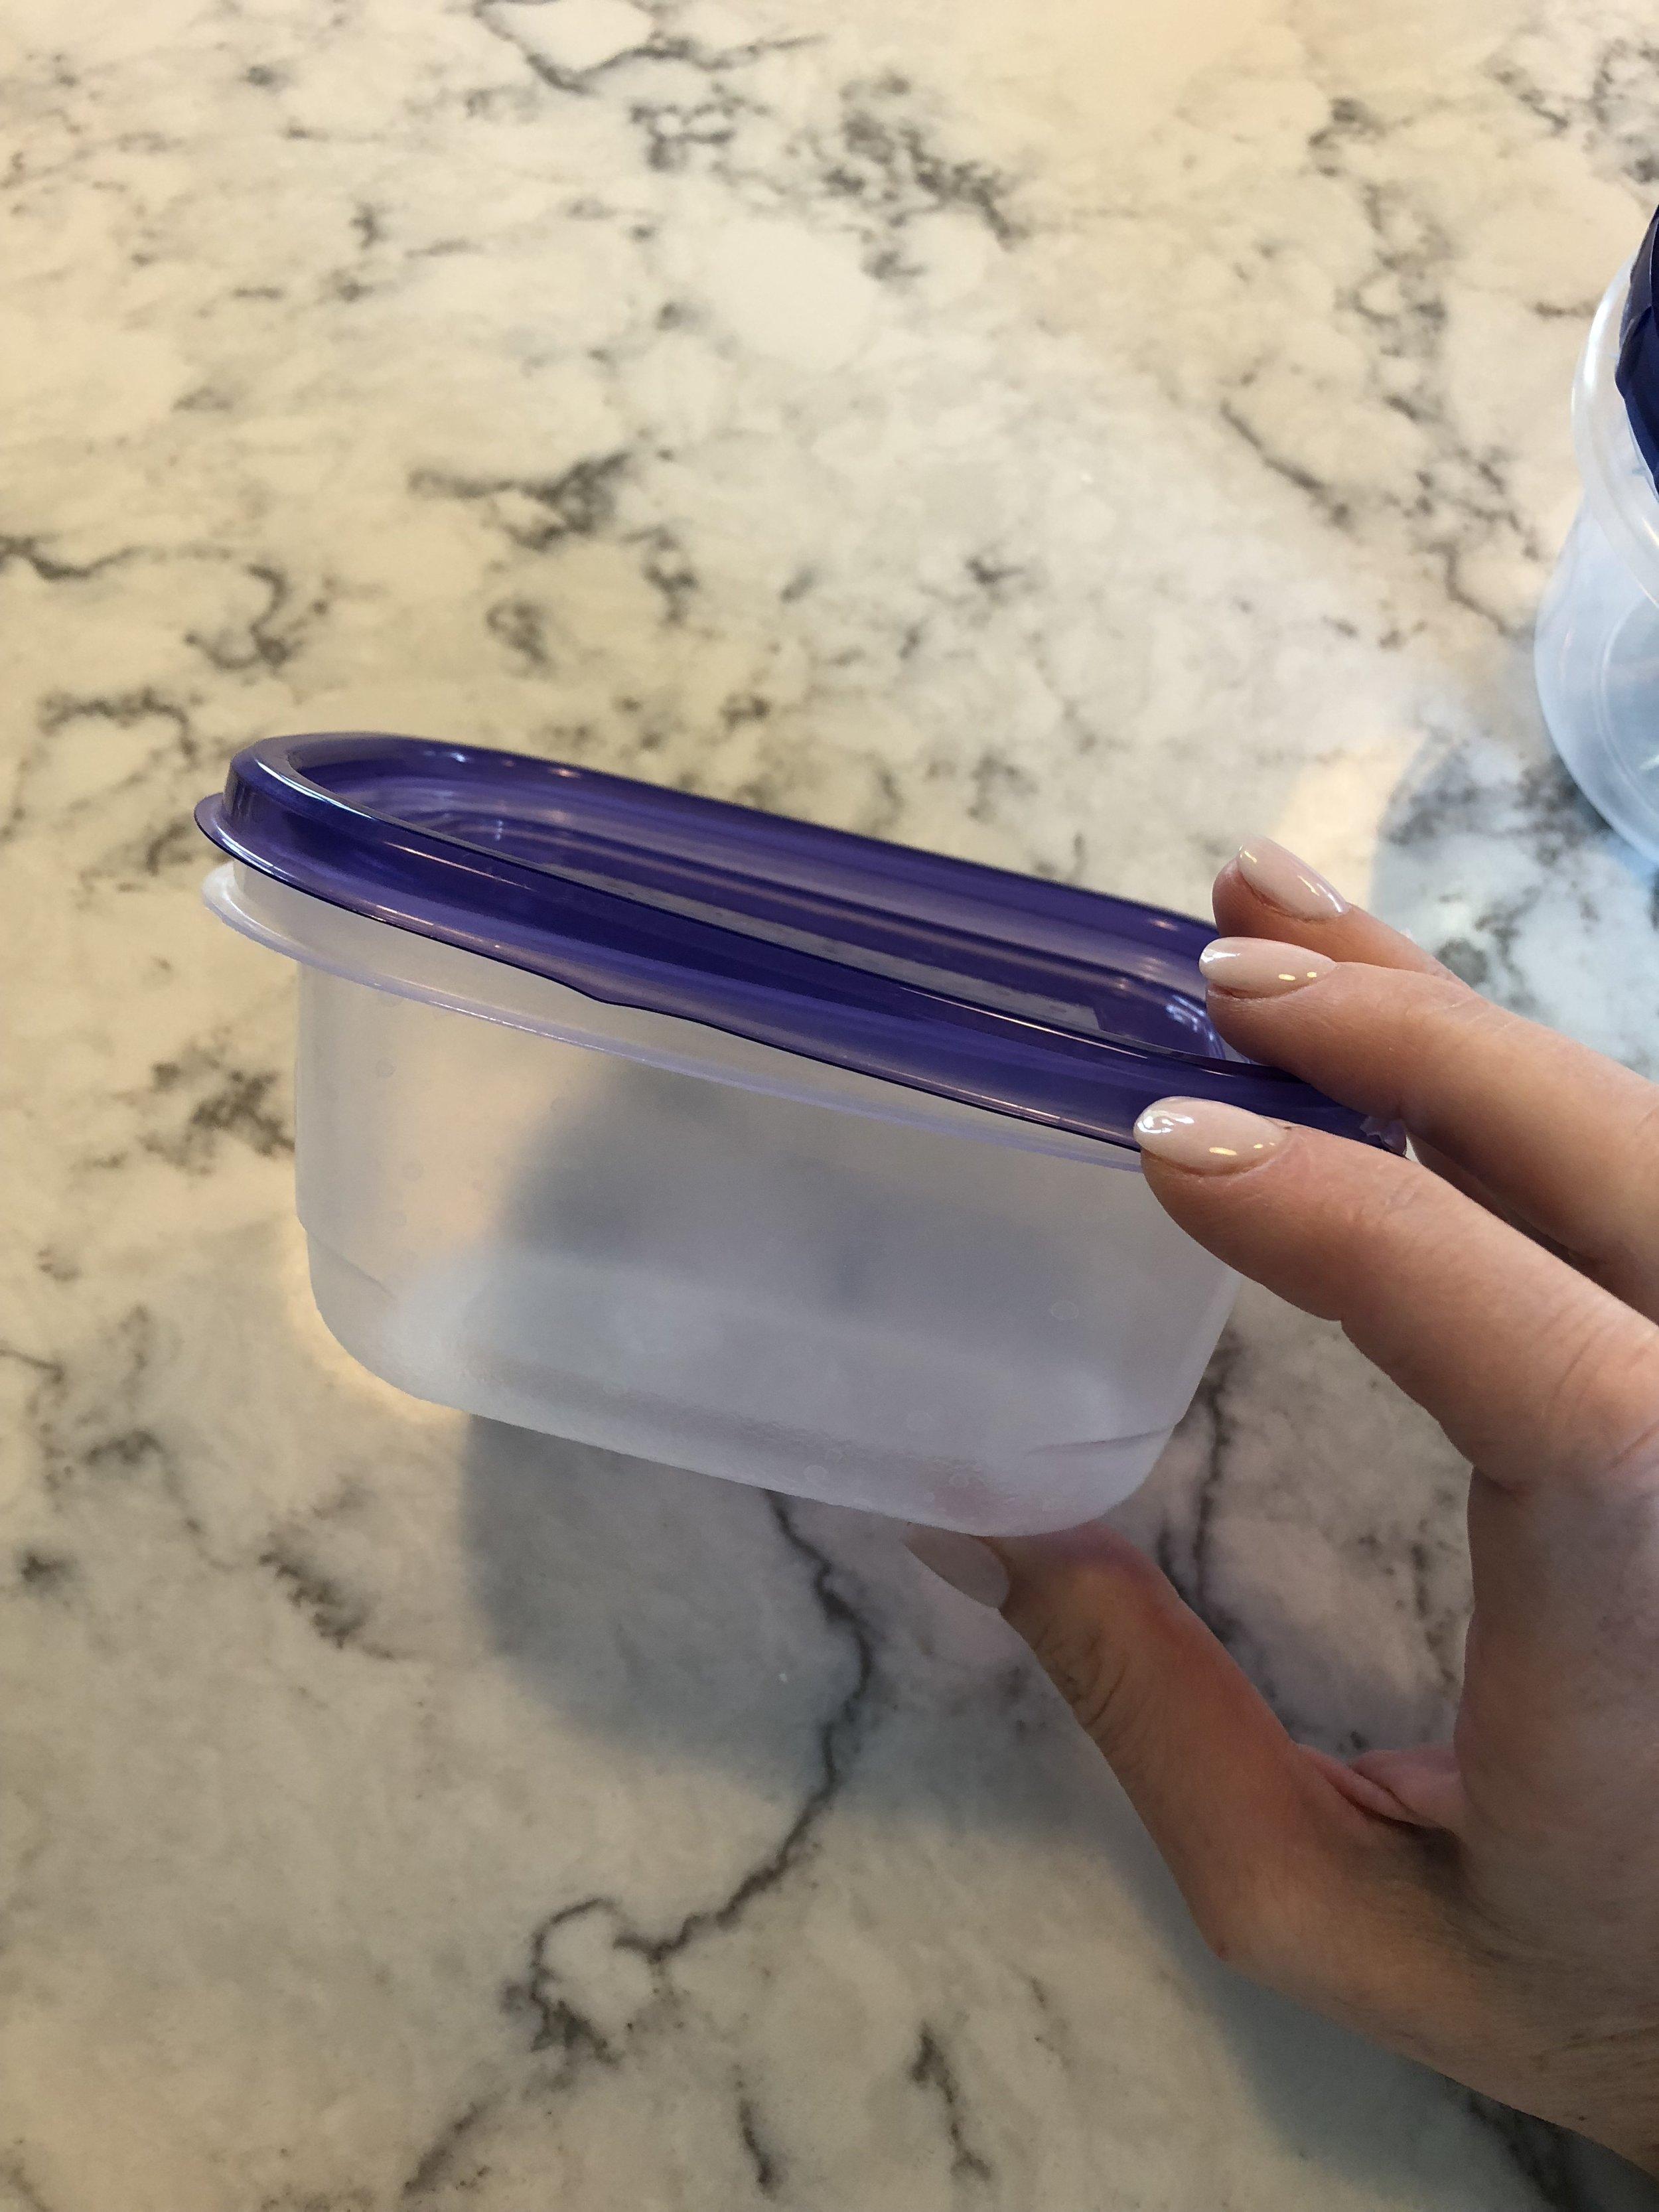 Small - 9.5 ounces